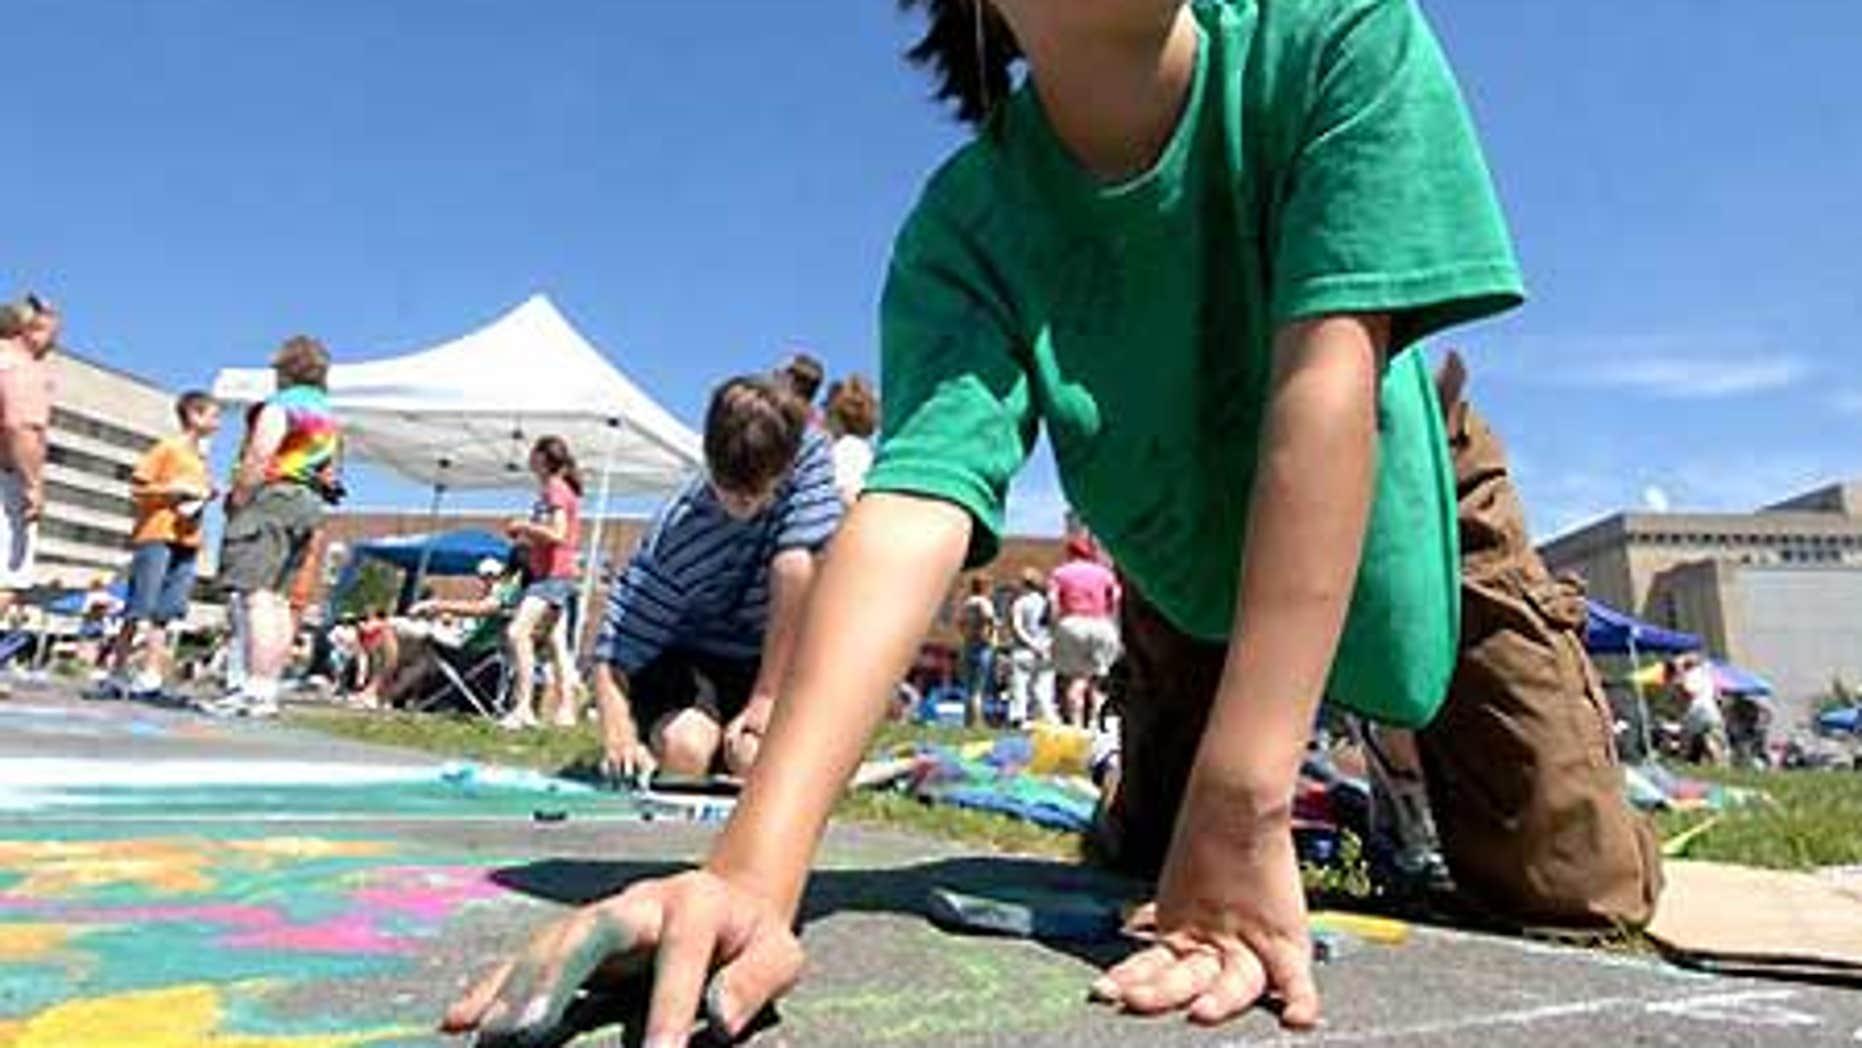 Madeline Kara Neumann works on chalk art during downtown Wausau's annual Chalk Fest.